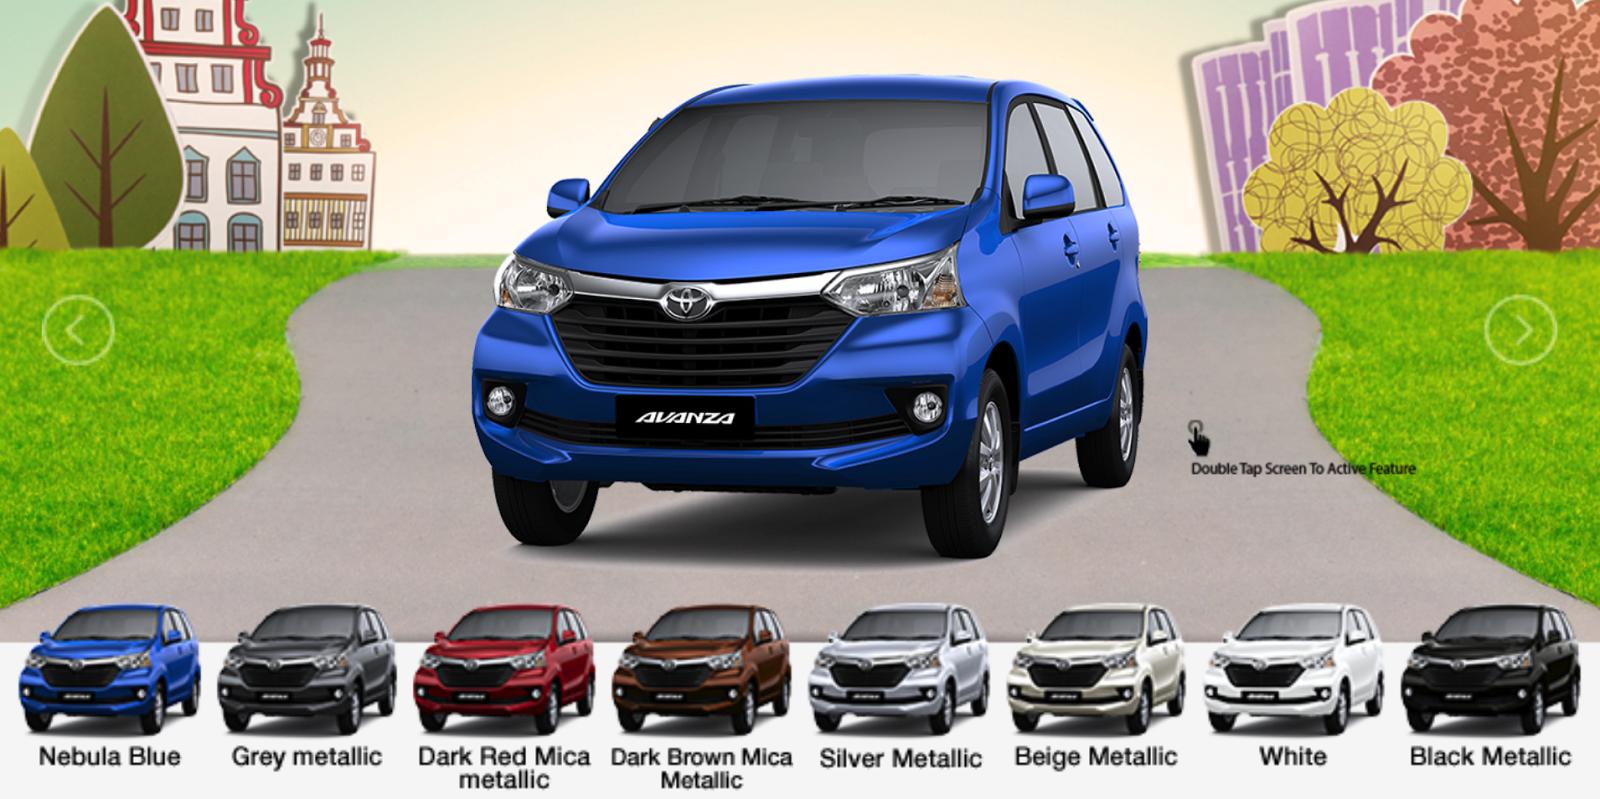 spesifikasi grand new avanza 2018 all toyota camry philippines and harga mobil baru semarang